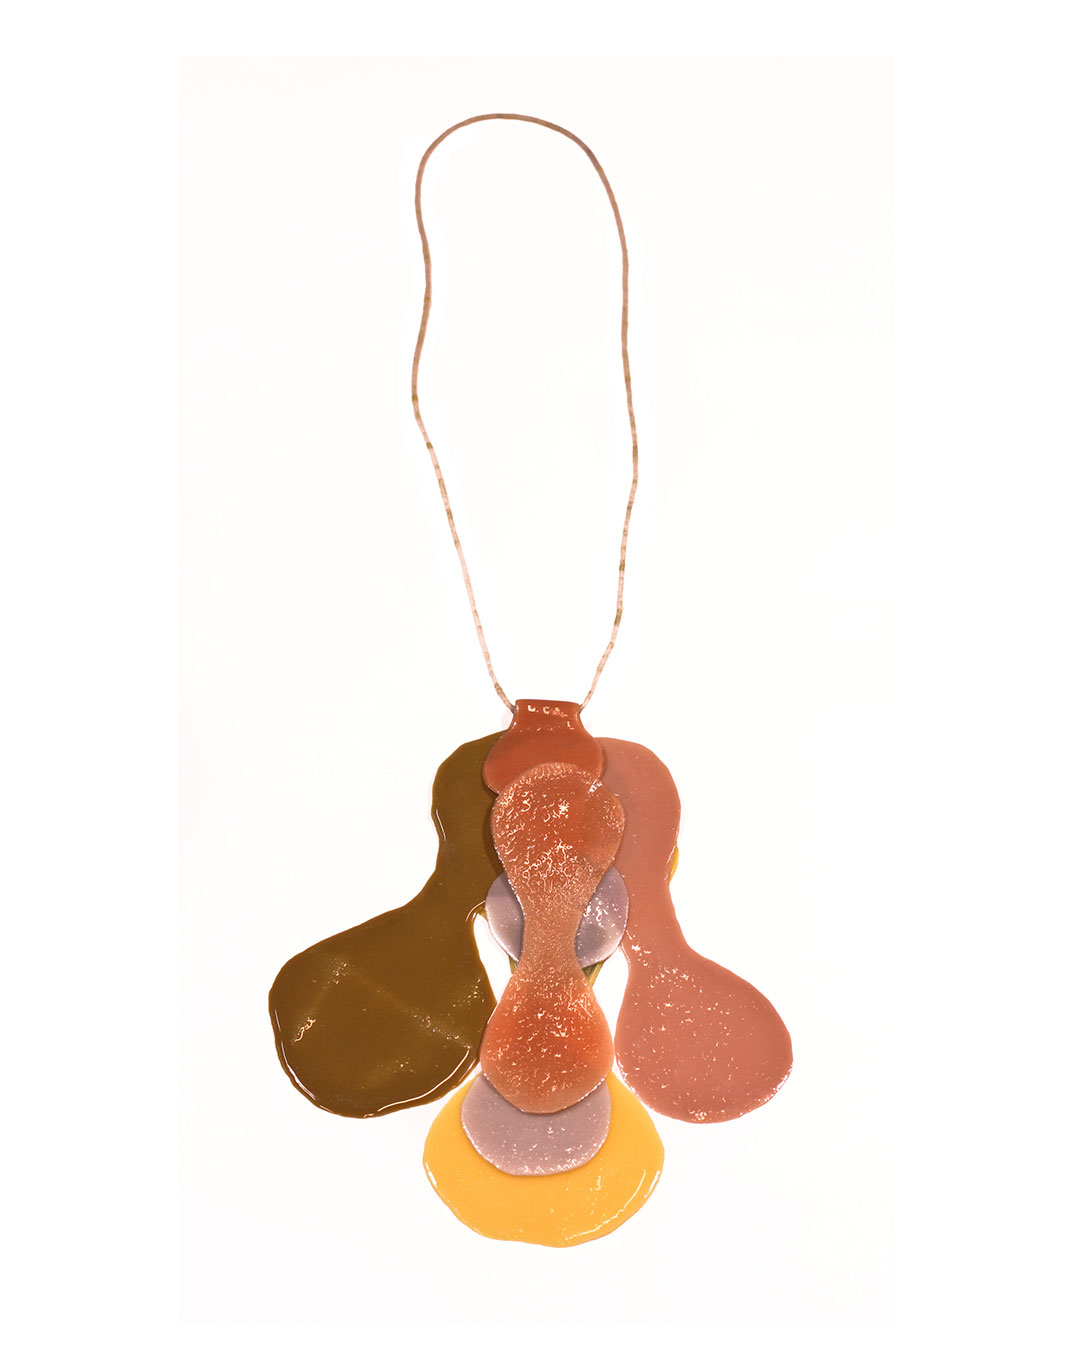 Ela Bauer, necklace, 2012, resin, pigment, jade, cotton, €860